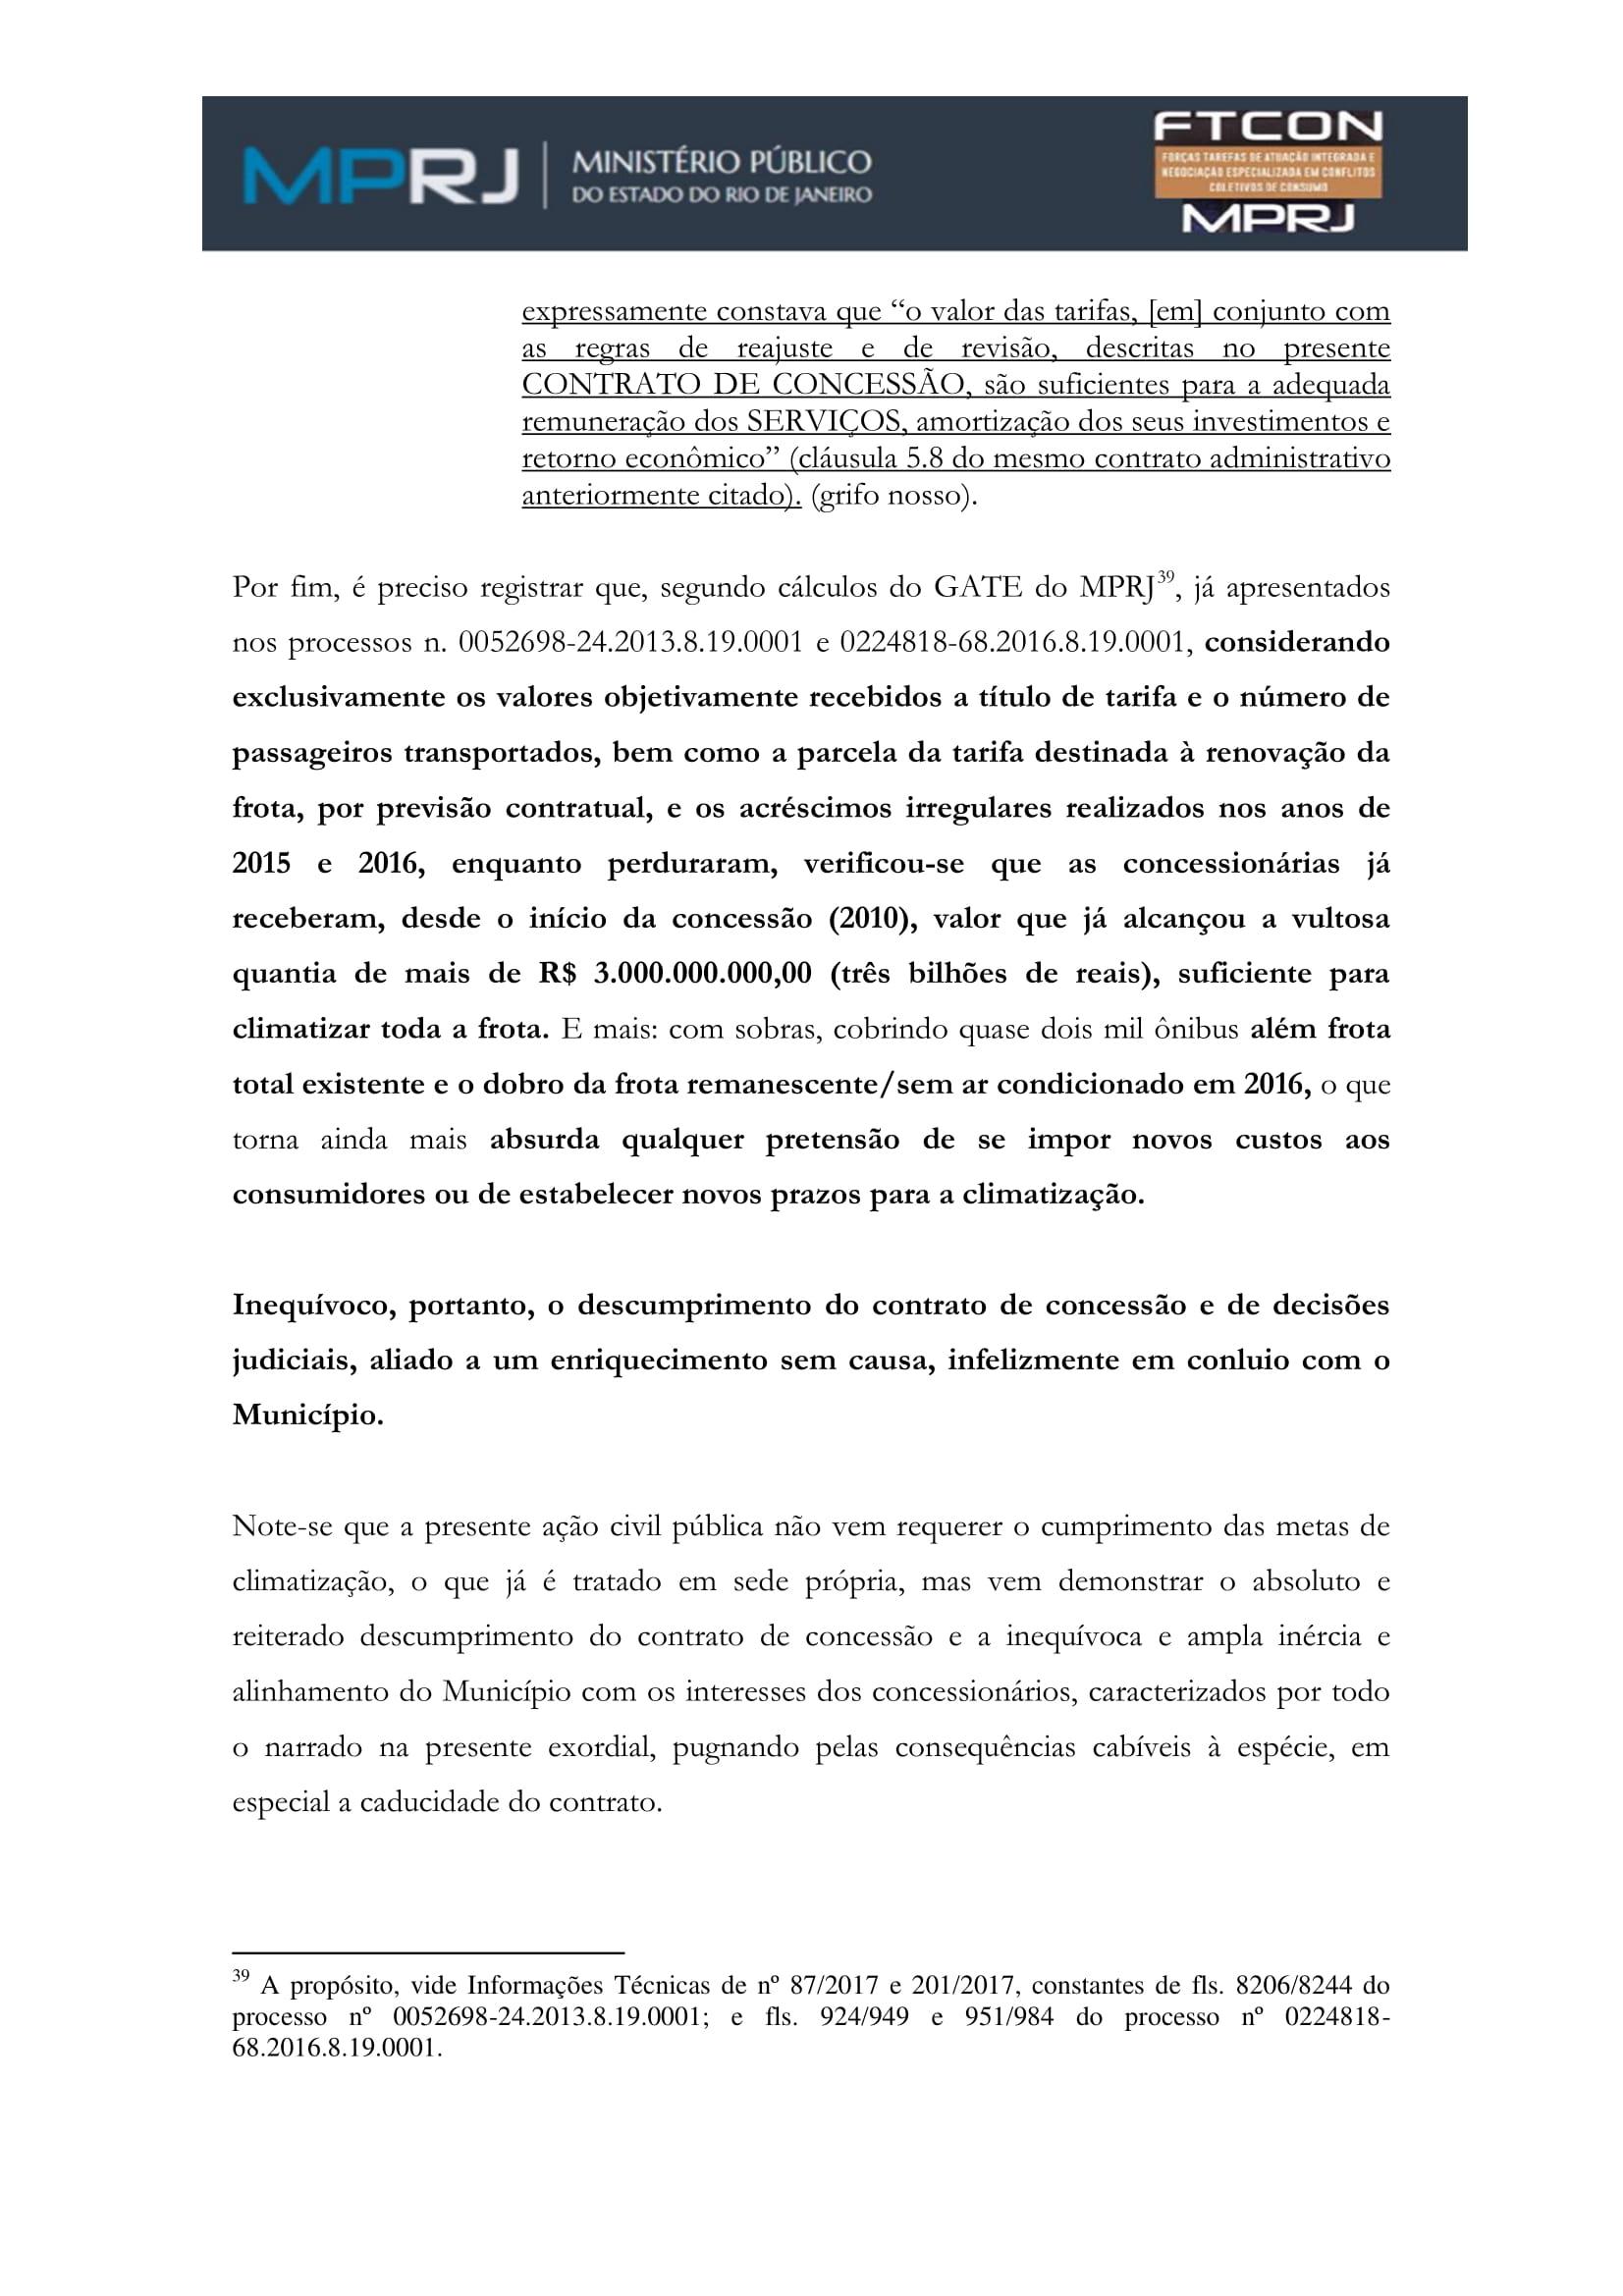 acp_caducidade_onibus_dr_rt-045